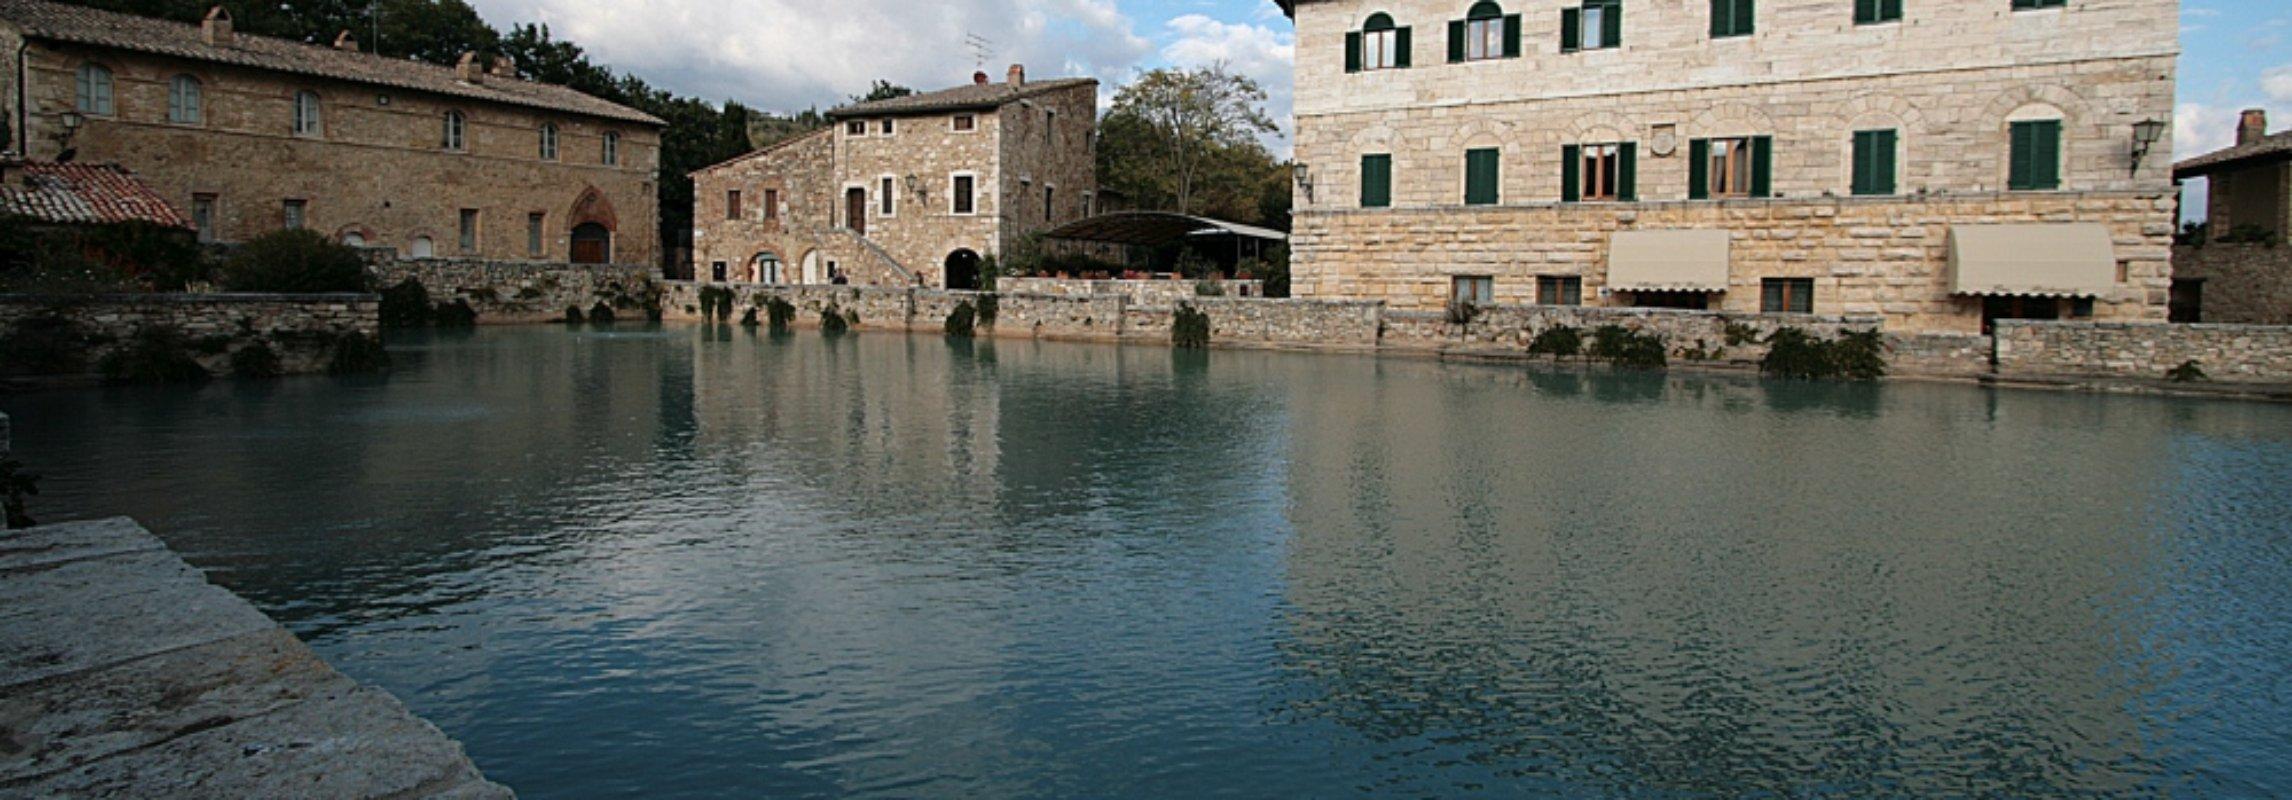 Terme di Bagno Vignoni | Visit Tuscany